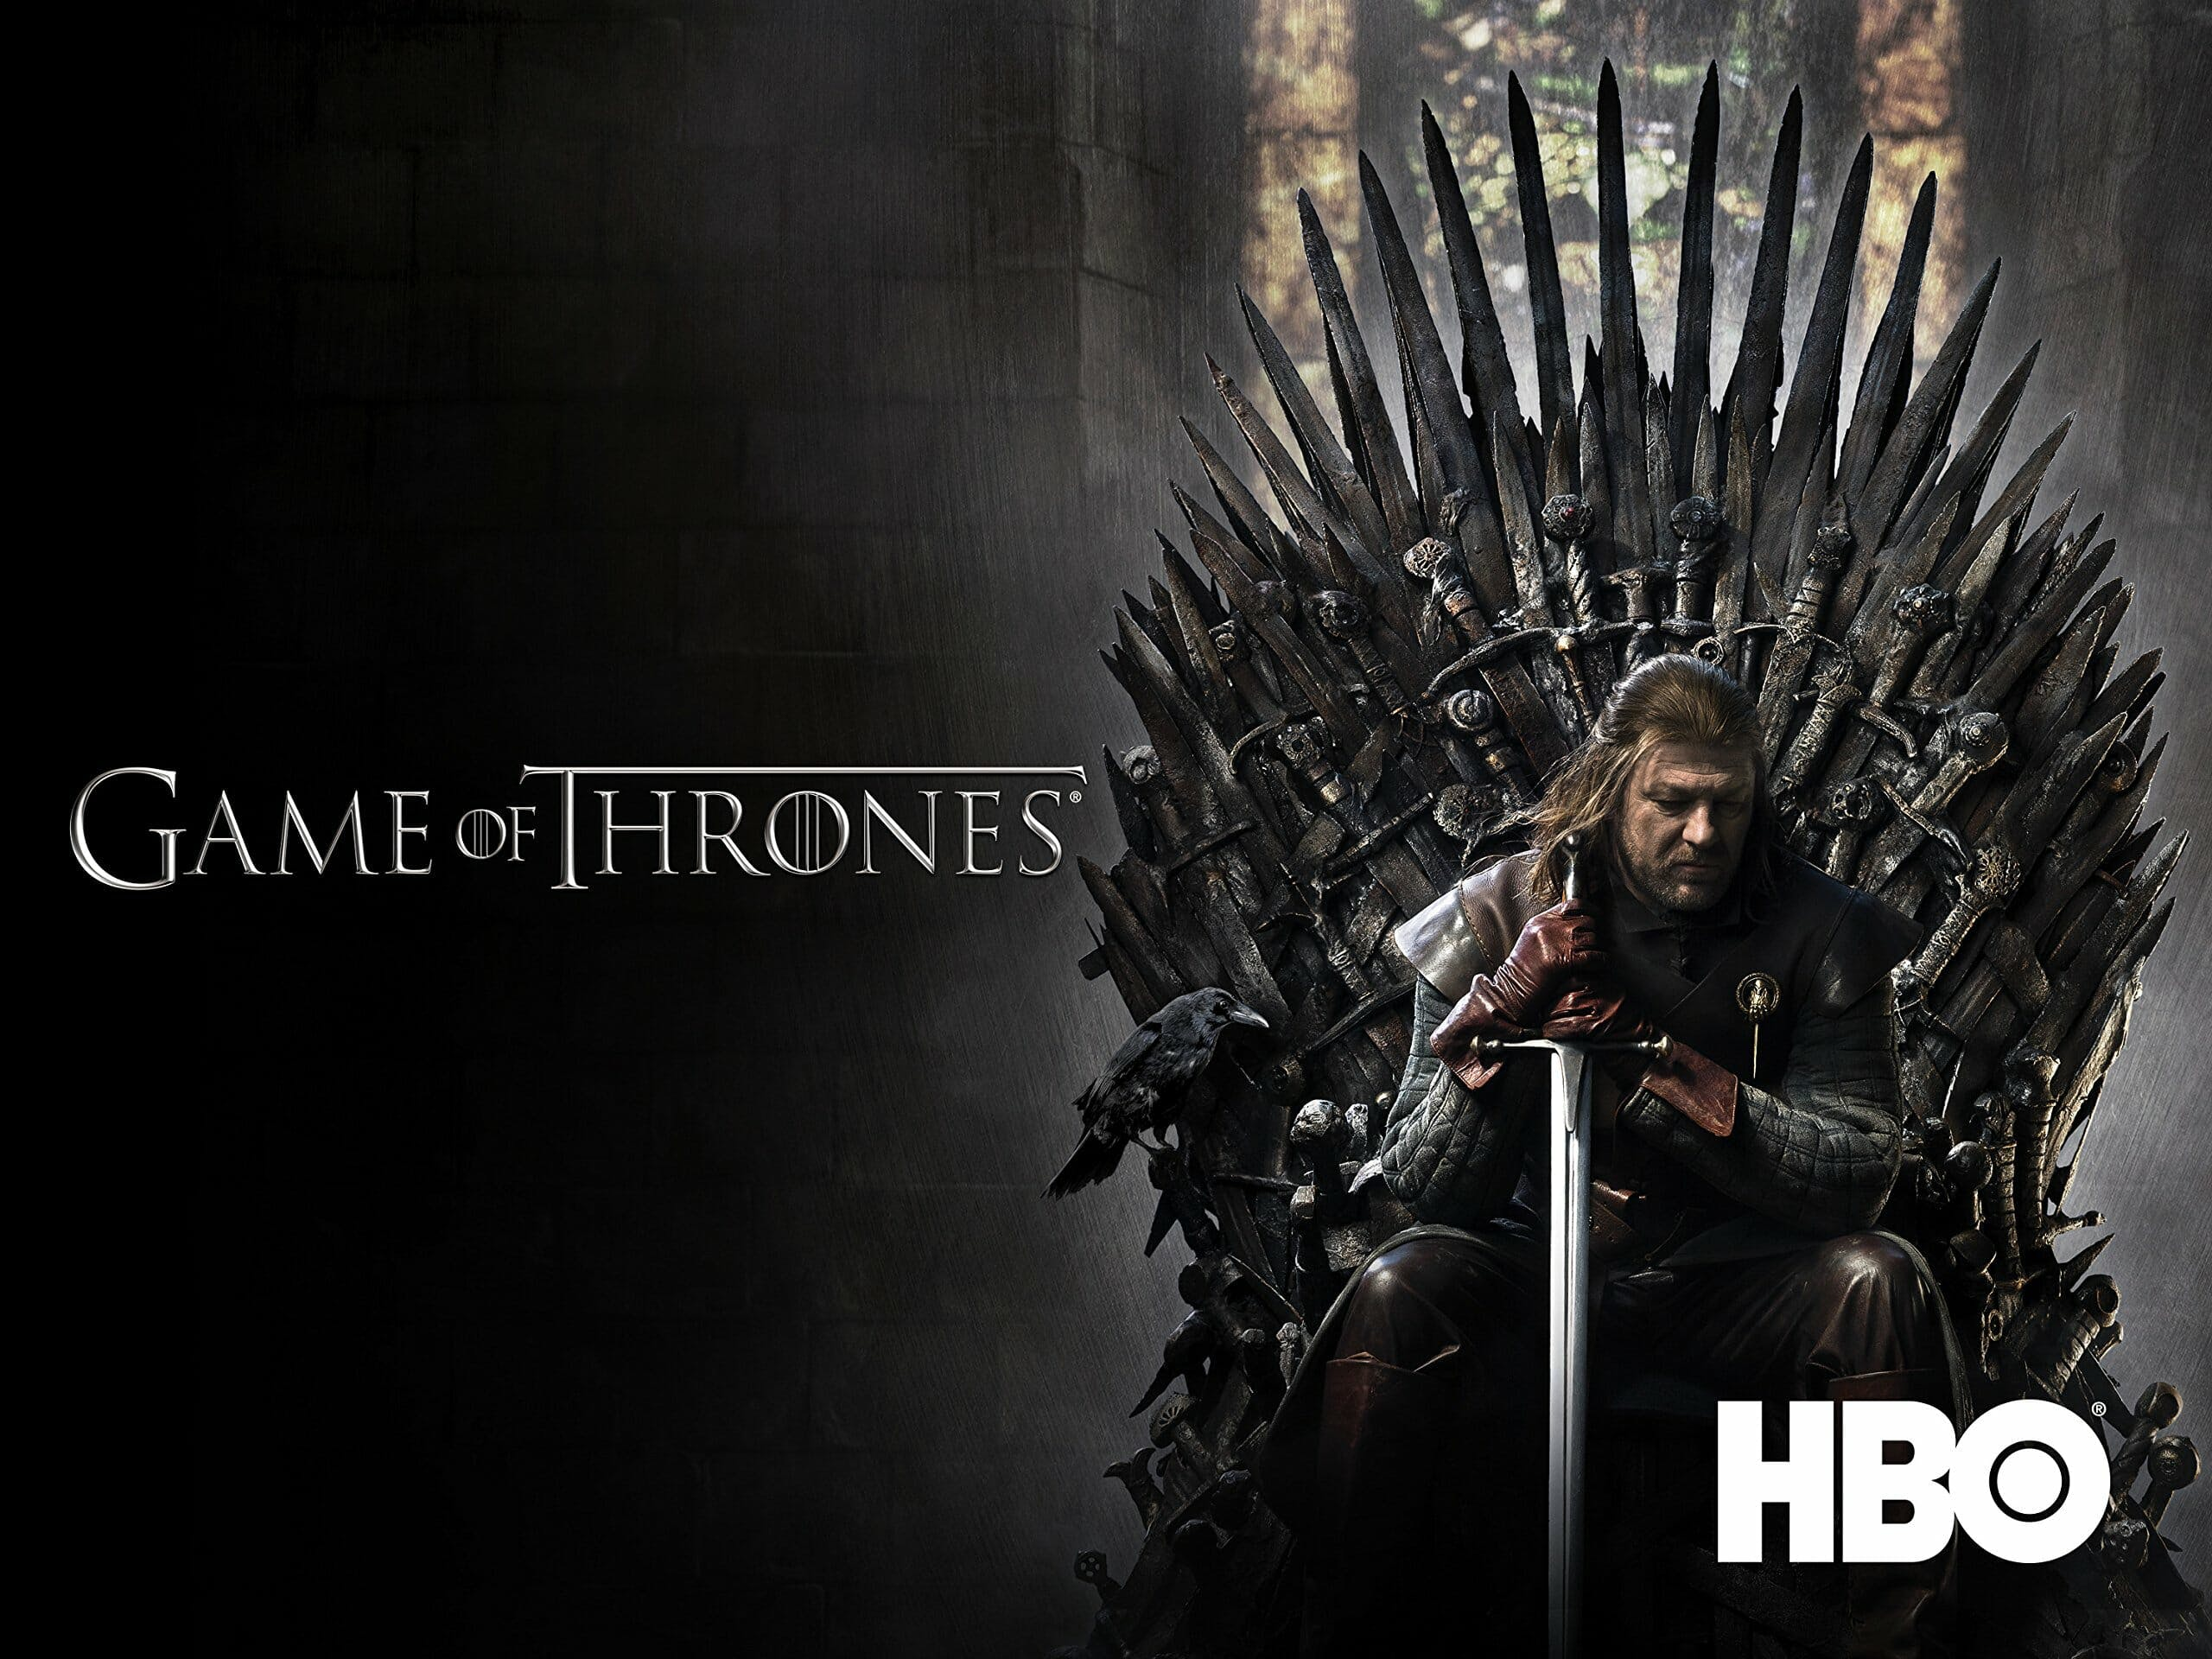 watch game of thrones season 8 online free on Amazon